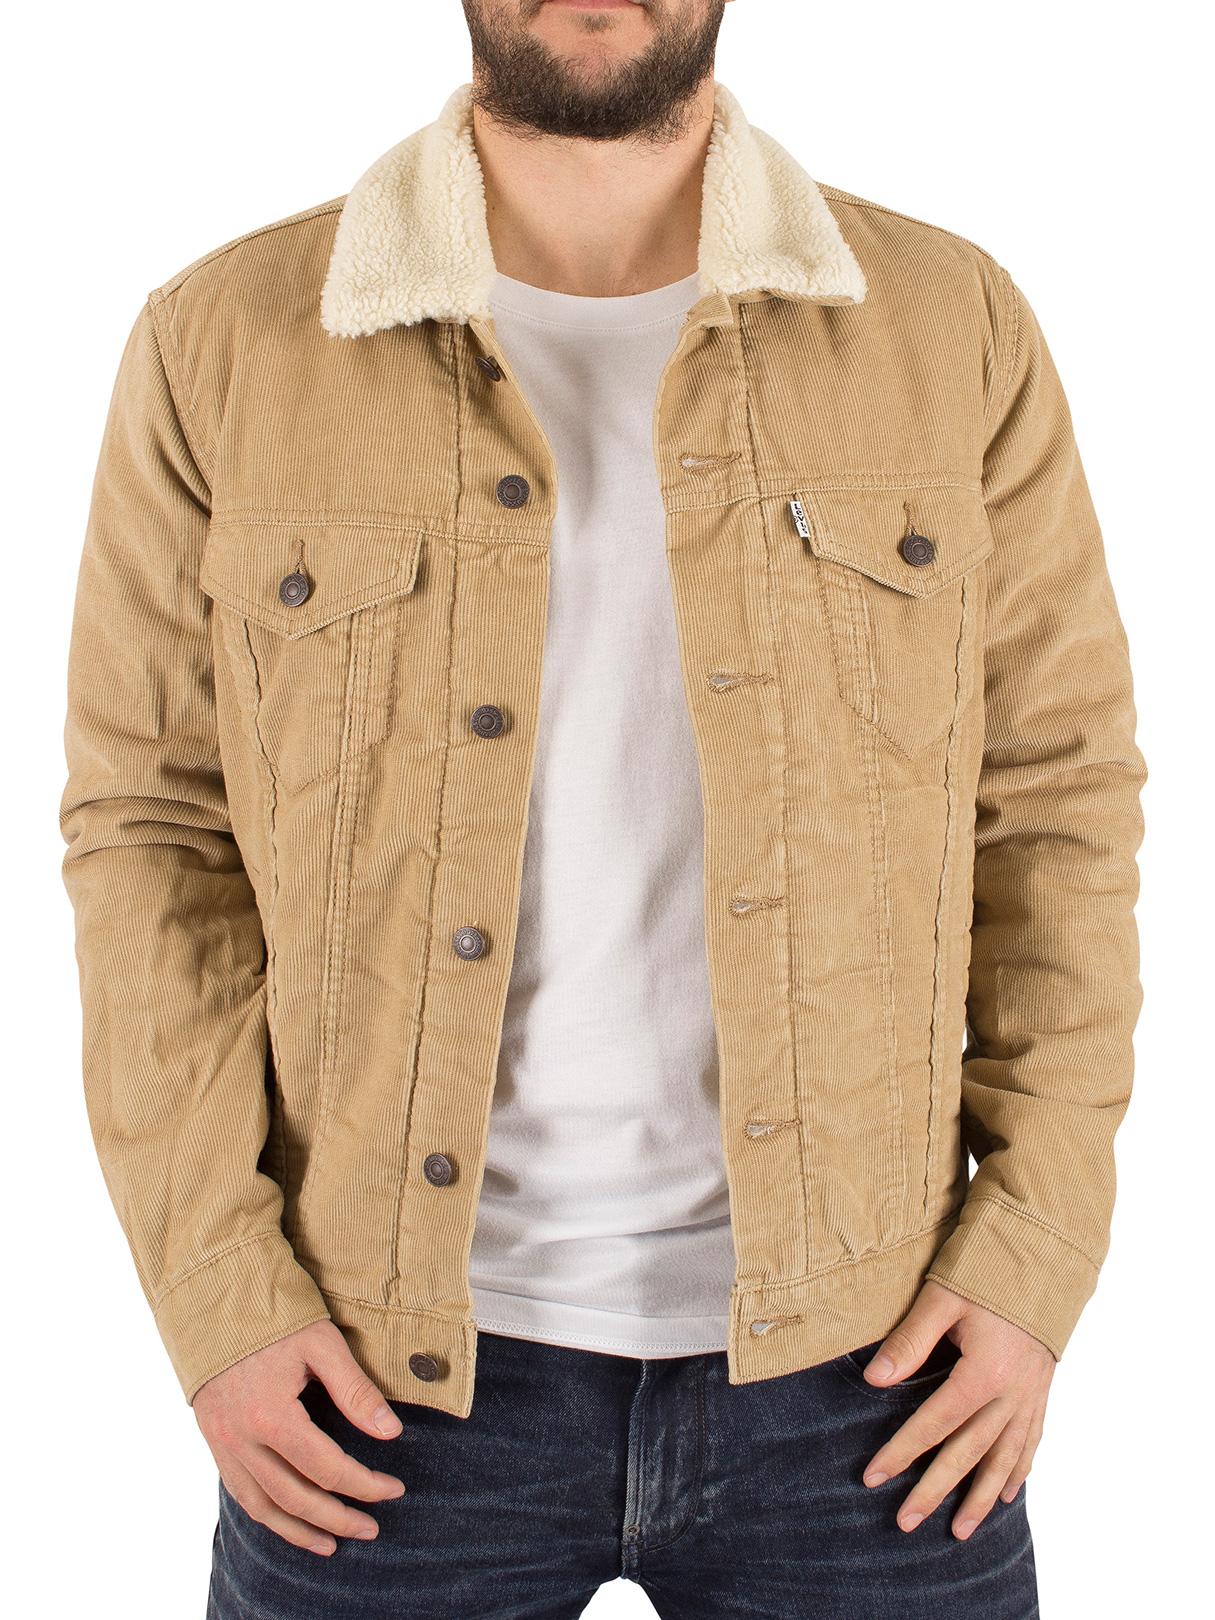 levi 39 s men 39 s good chino sherpa trucker jacket beige ebay. Black Bedroom Furniture Sets. Home Design Ideas